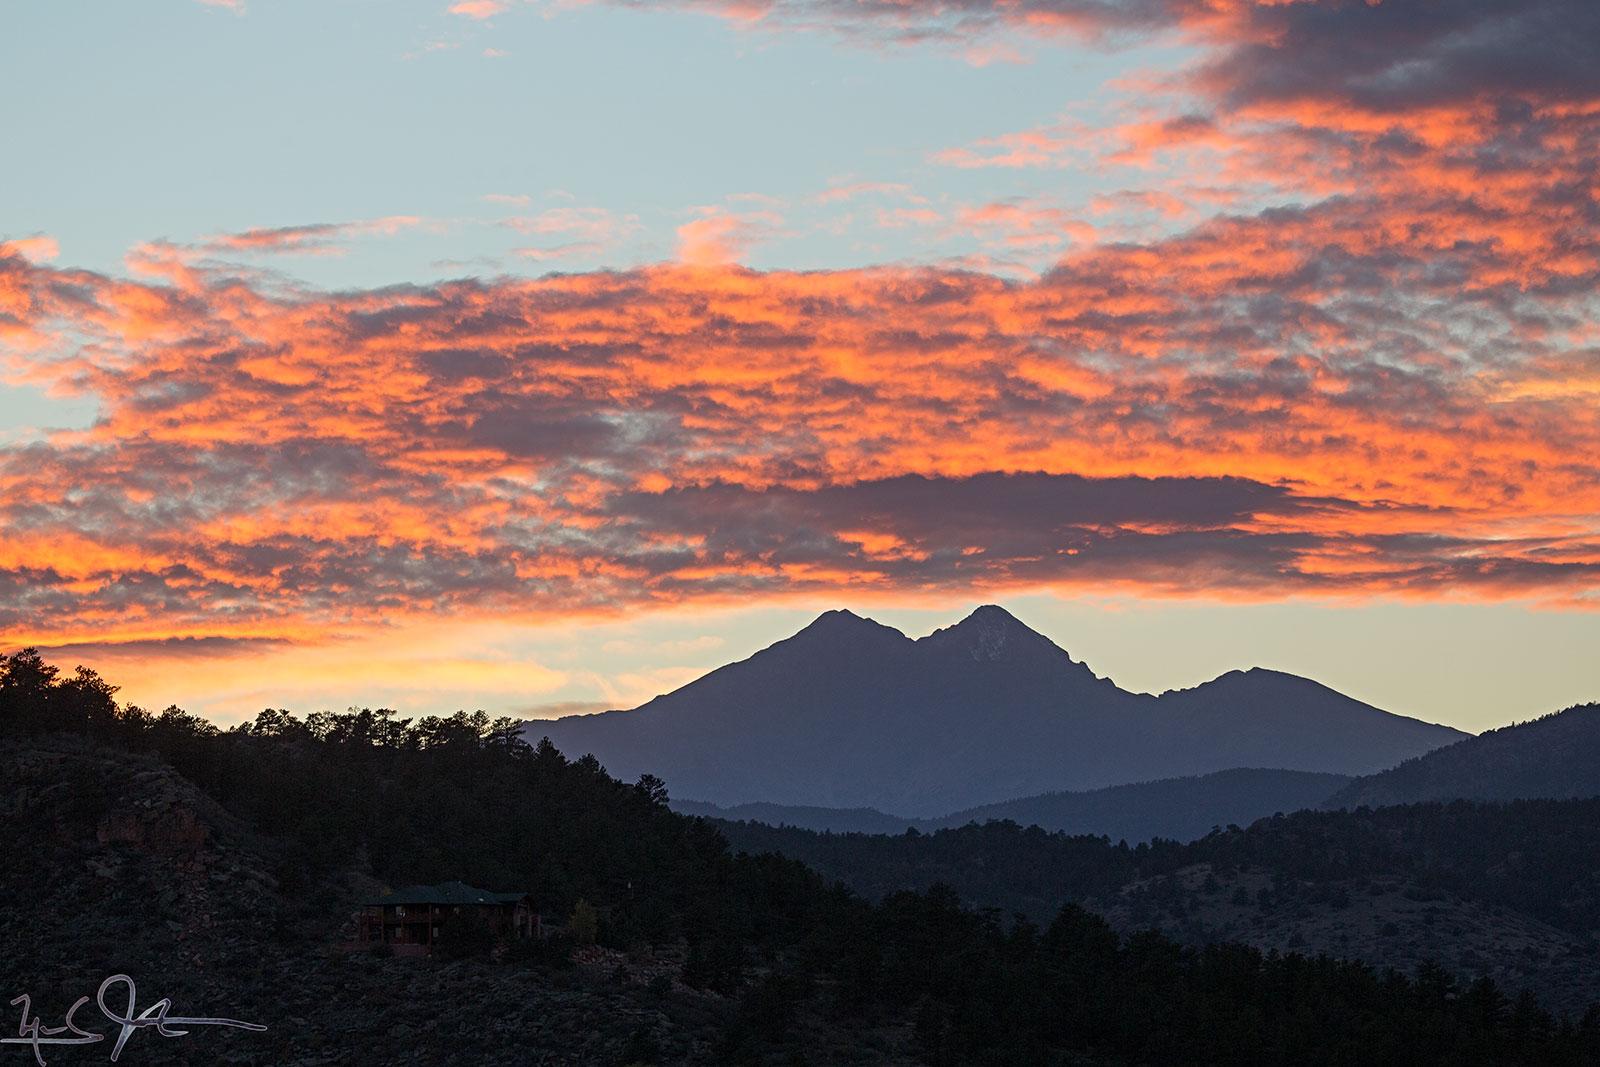 Mount Meeker, Long's Peak, and Mount Lady Washington.